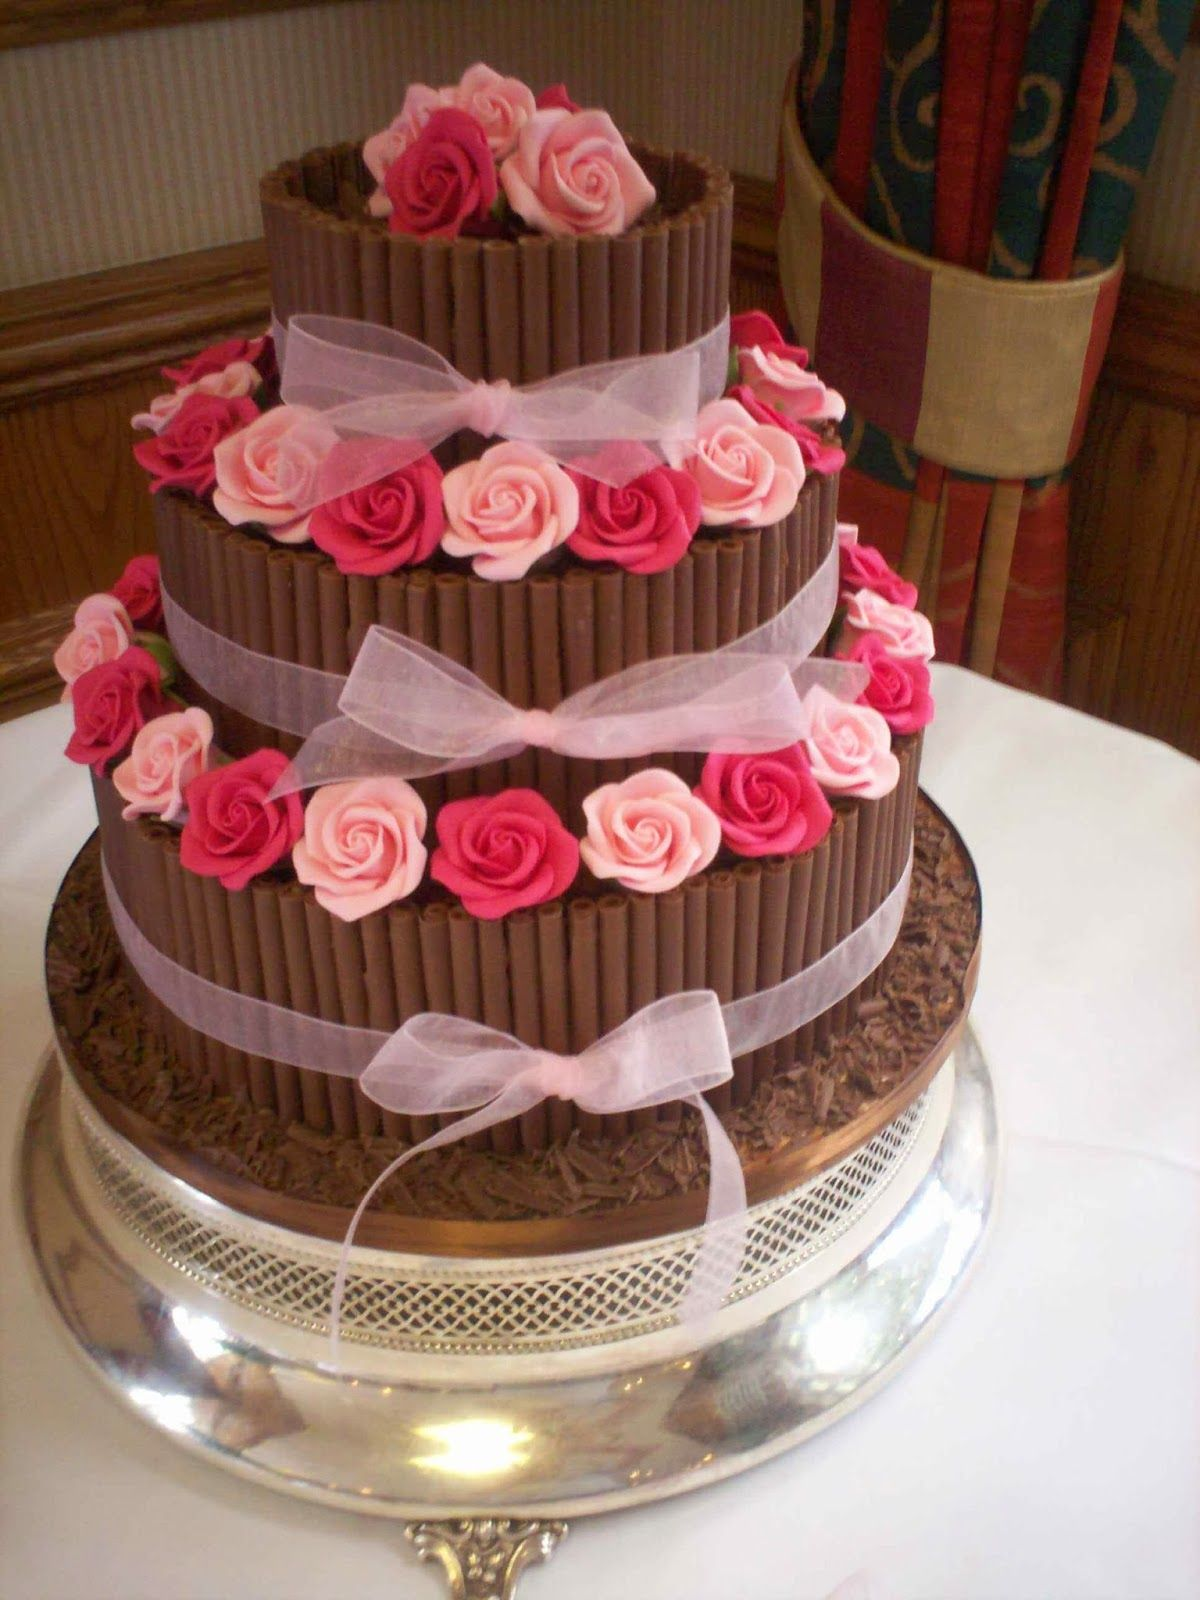 Chocolate Cake Hd Wallpapers Free Download Unique Wallpapers Baby Birthday Cakes Chocolate Cake Rihanna Birthday Cake